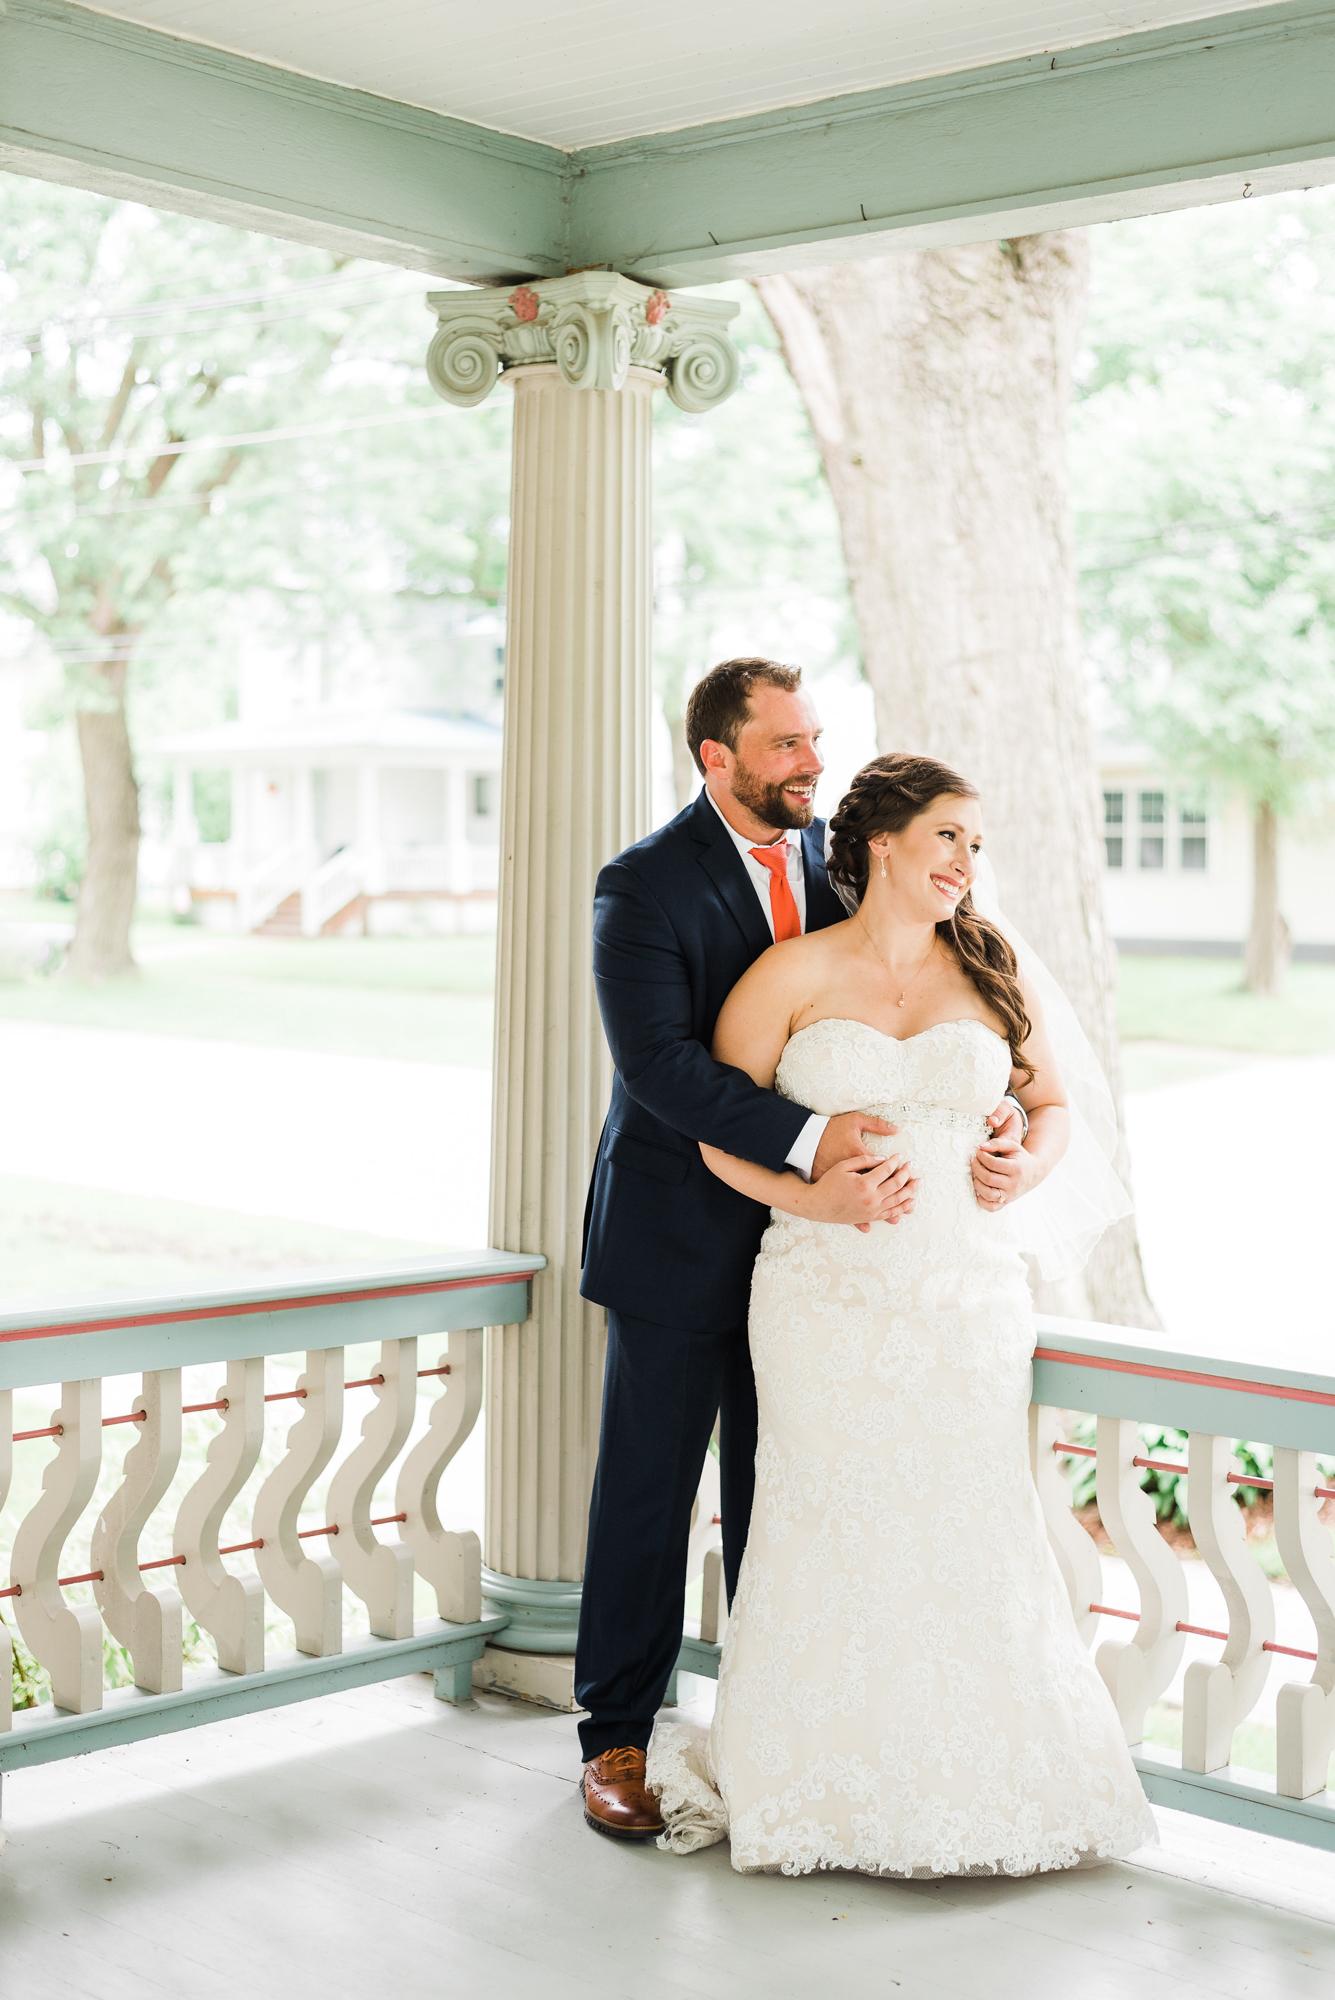 Tipton, Iowa June Wedding Photographer